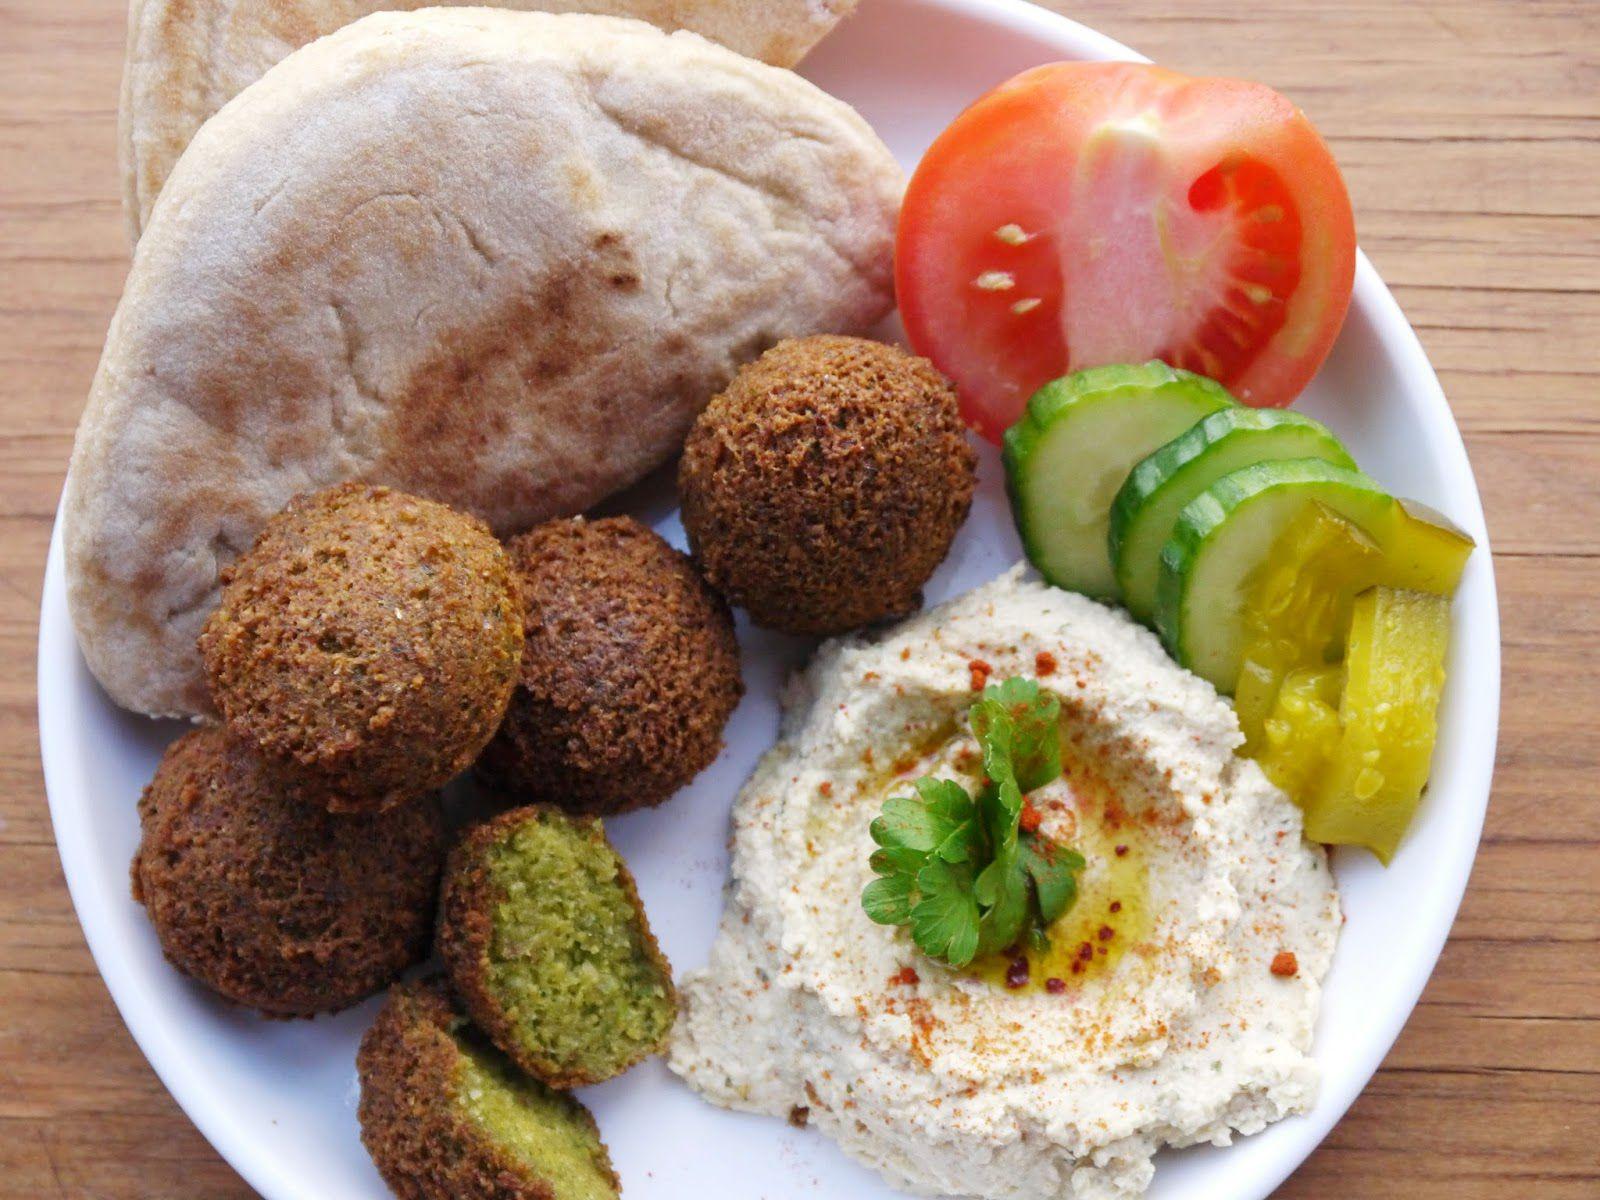 International Falafel Day - June 12